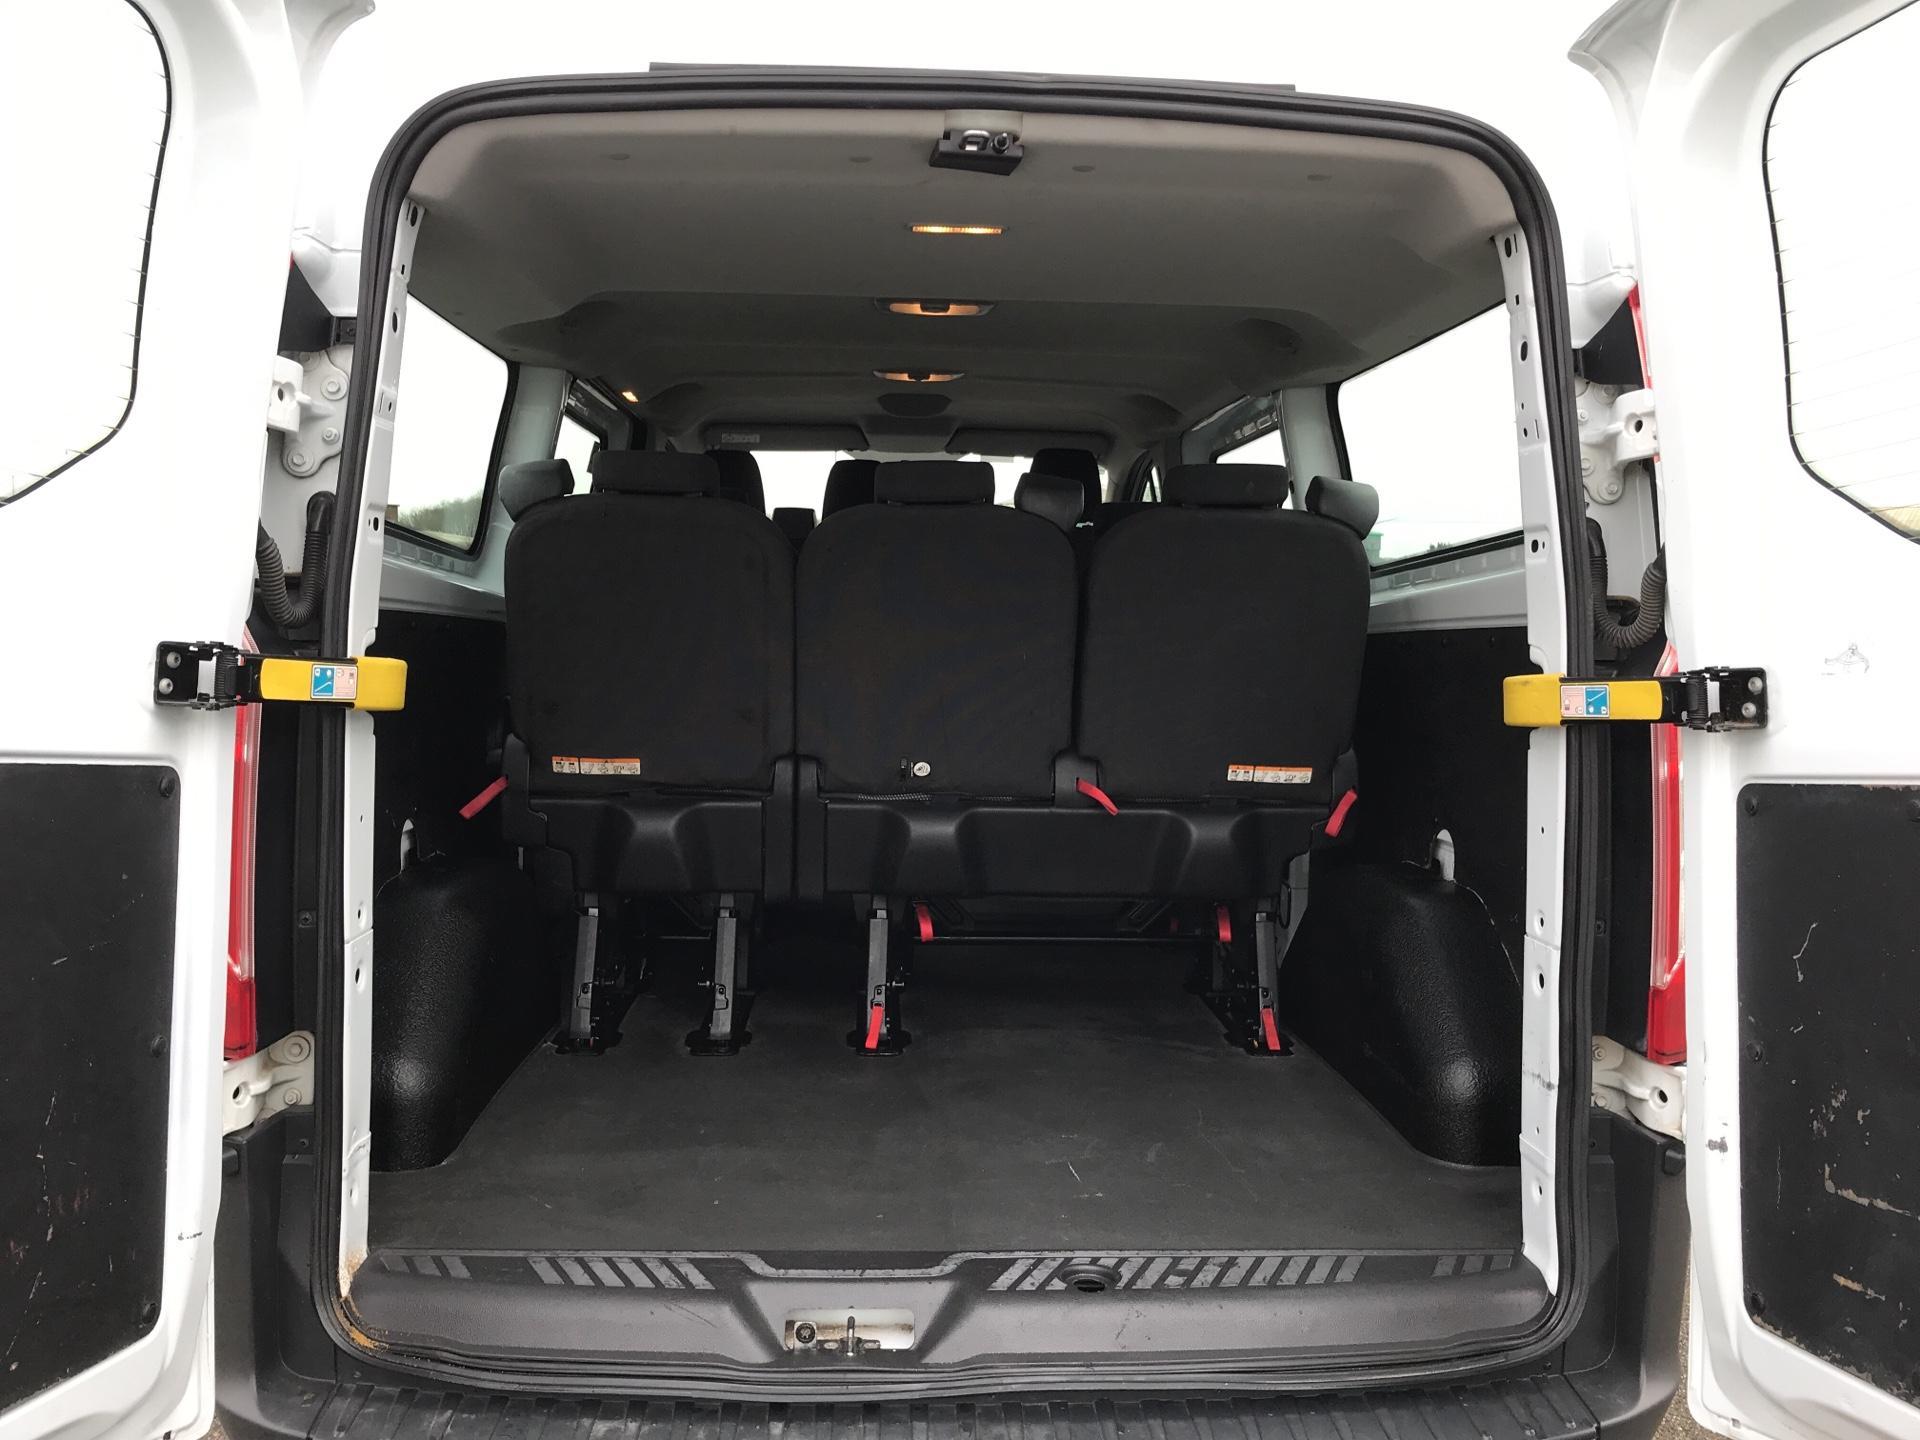 2015 Ford Transit Custom 310 L2 DIESEL FWD 2.2 TDCI 125PS LOW ROOF KOMBI VAN EURO 5 VAT INC (WV15JNJ) Image 15